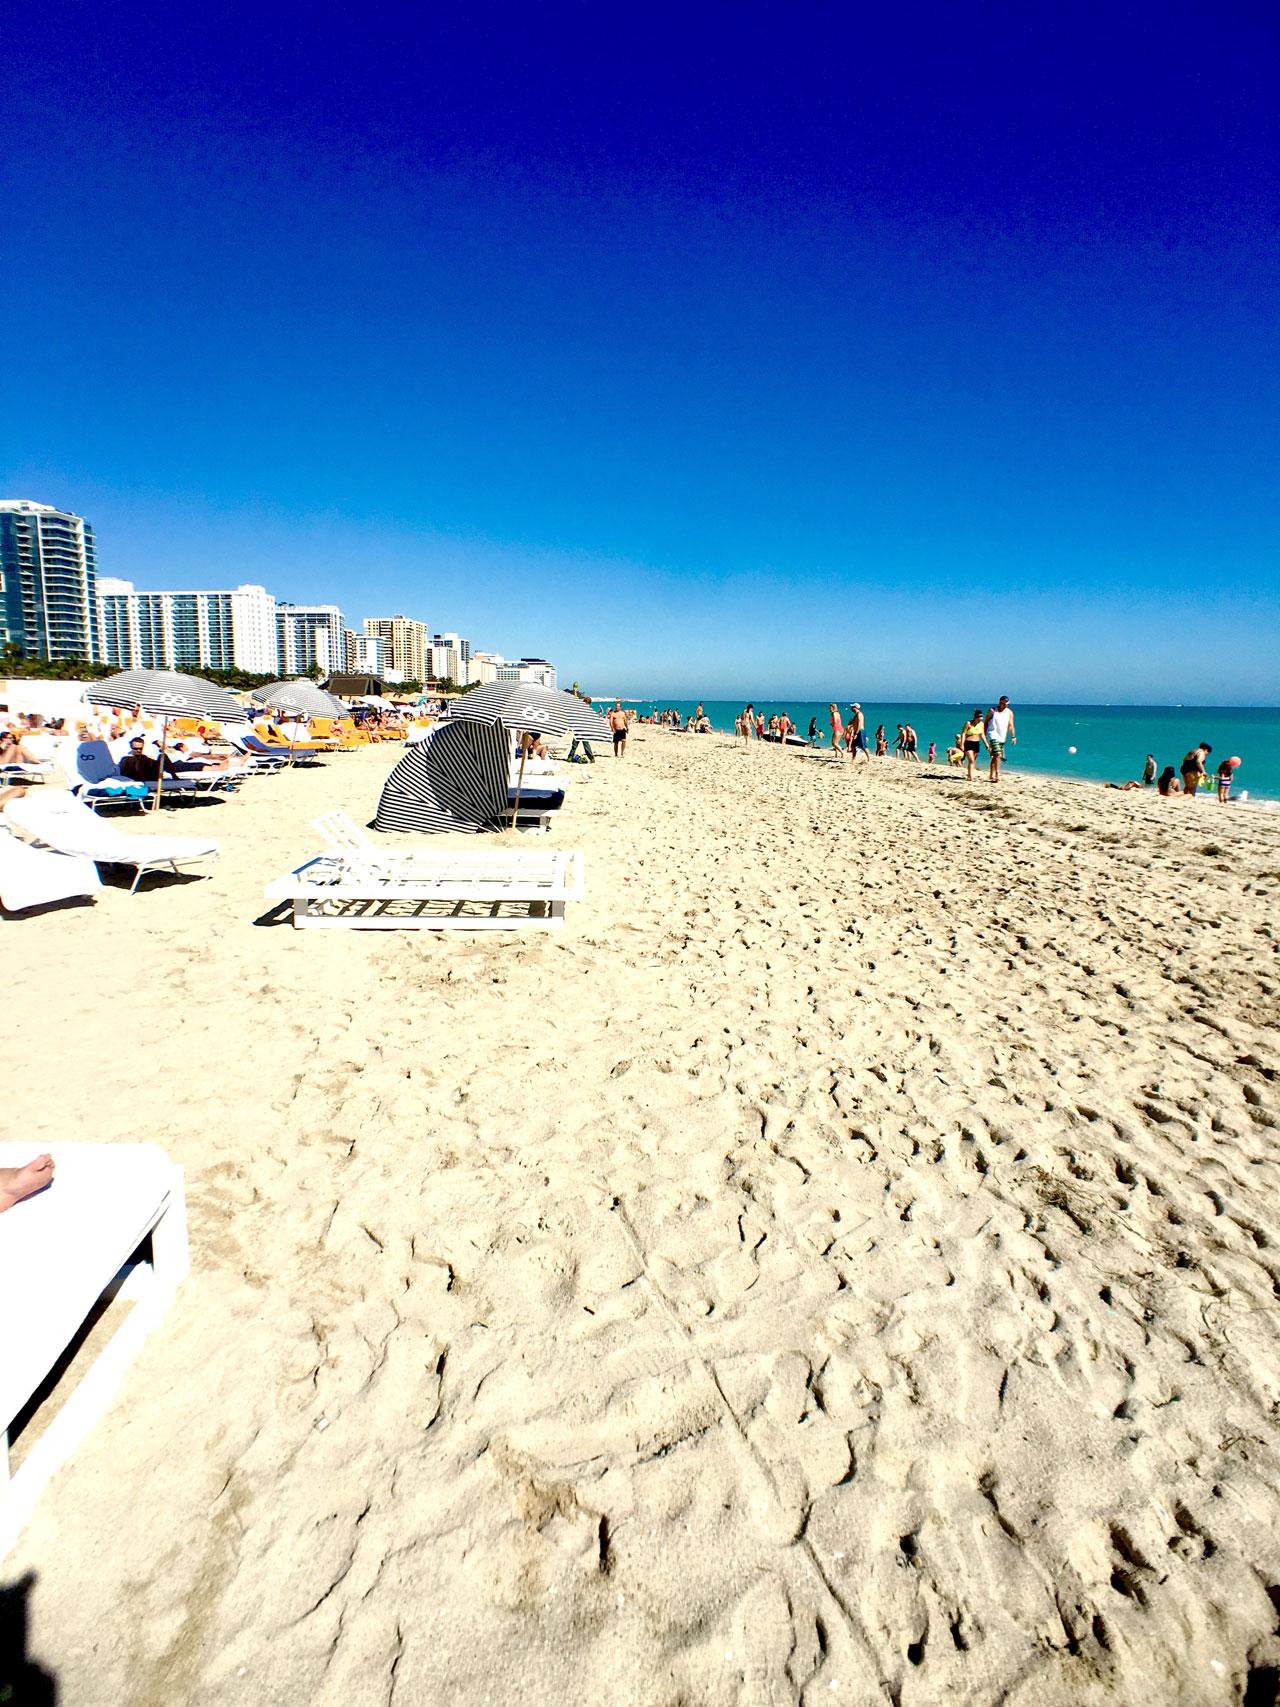 Miami South Beach Local Wildlife: Road Trip From Kissimmee To Miami South Beach